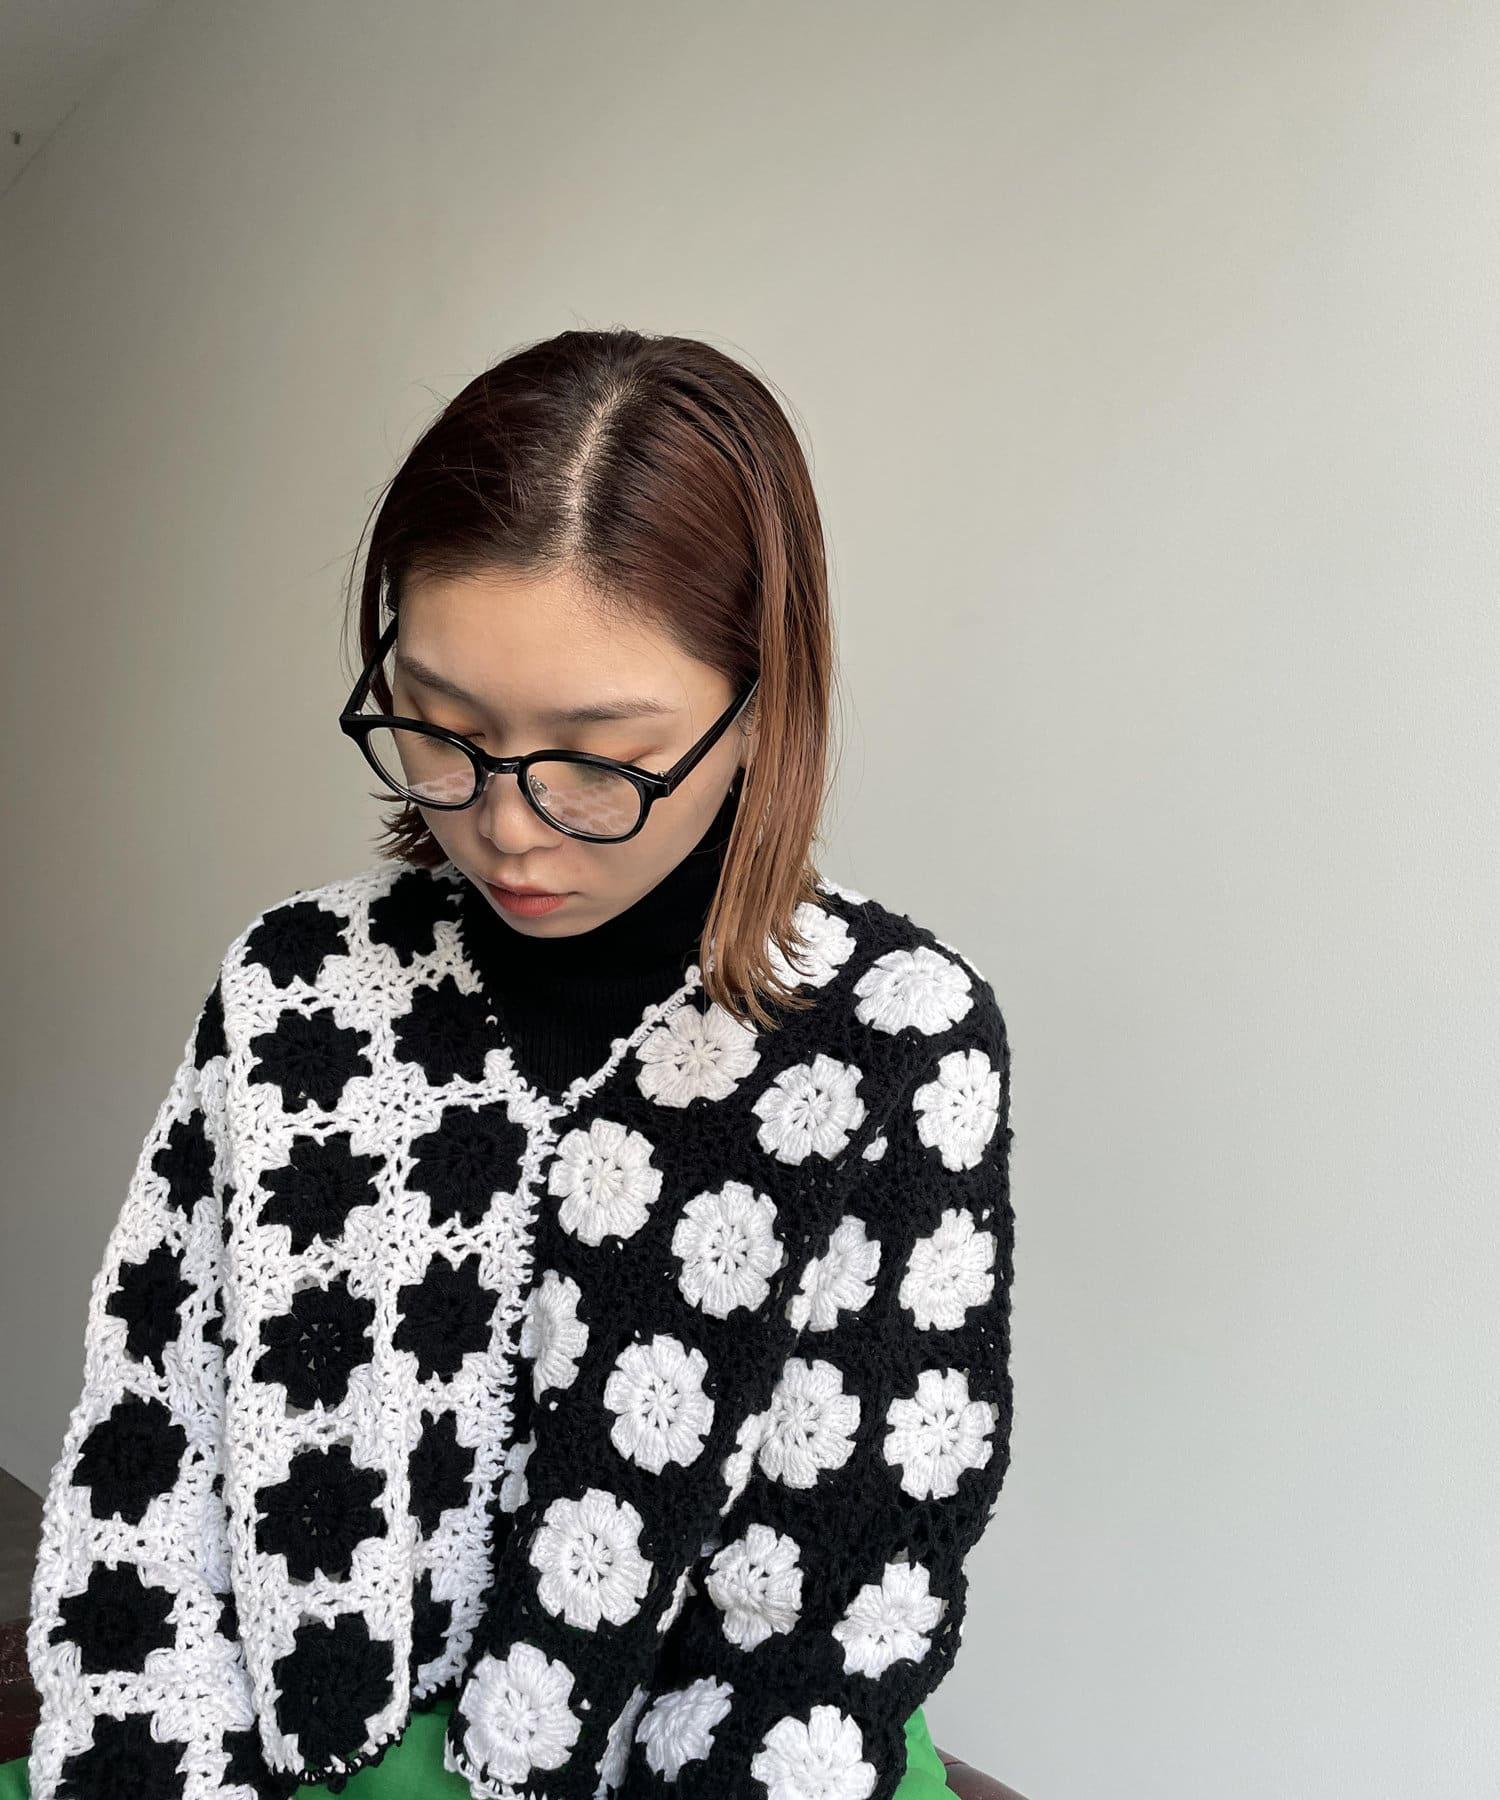 mona Belinda(モナ ベリンダ) 【ハンドメイド仕様】クロシェ編みクロップドニット